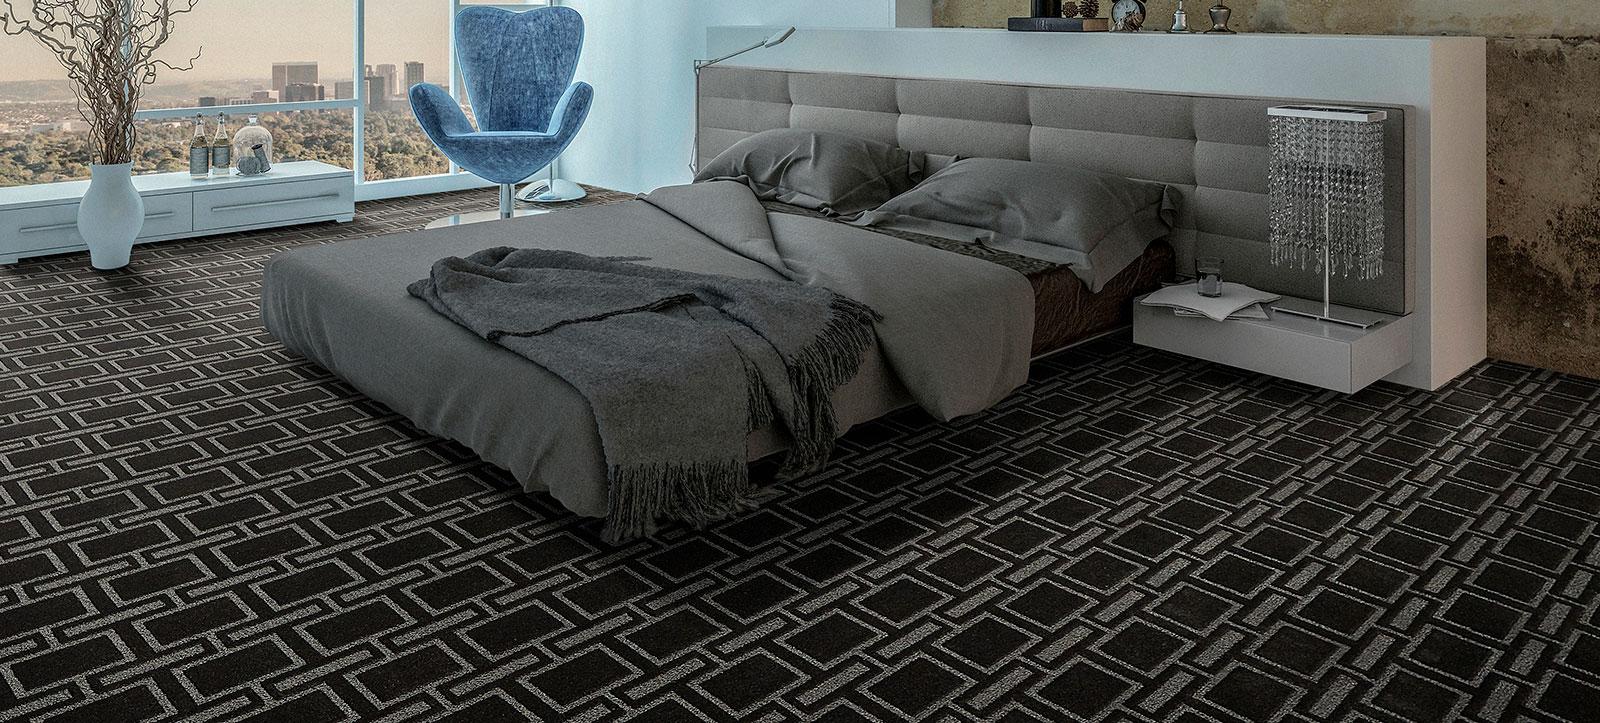 Image of Residential Carpeting Port Elizabeth